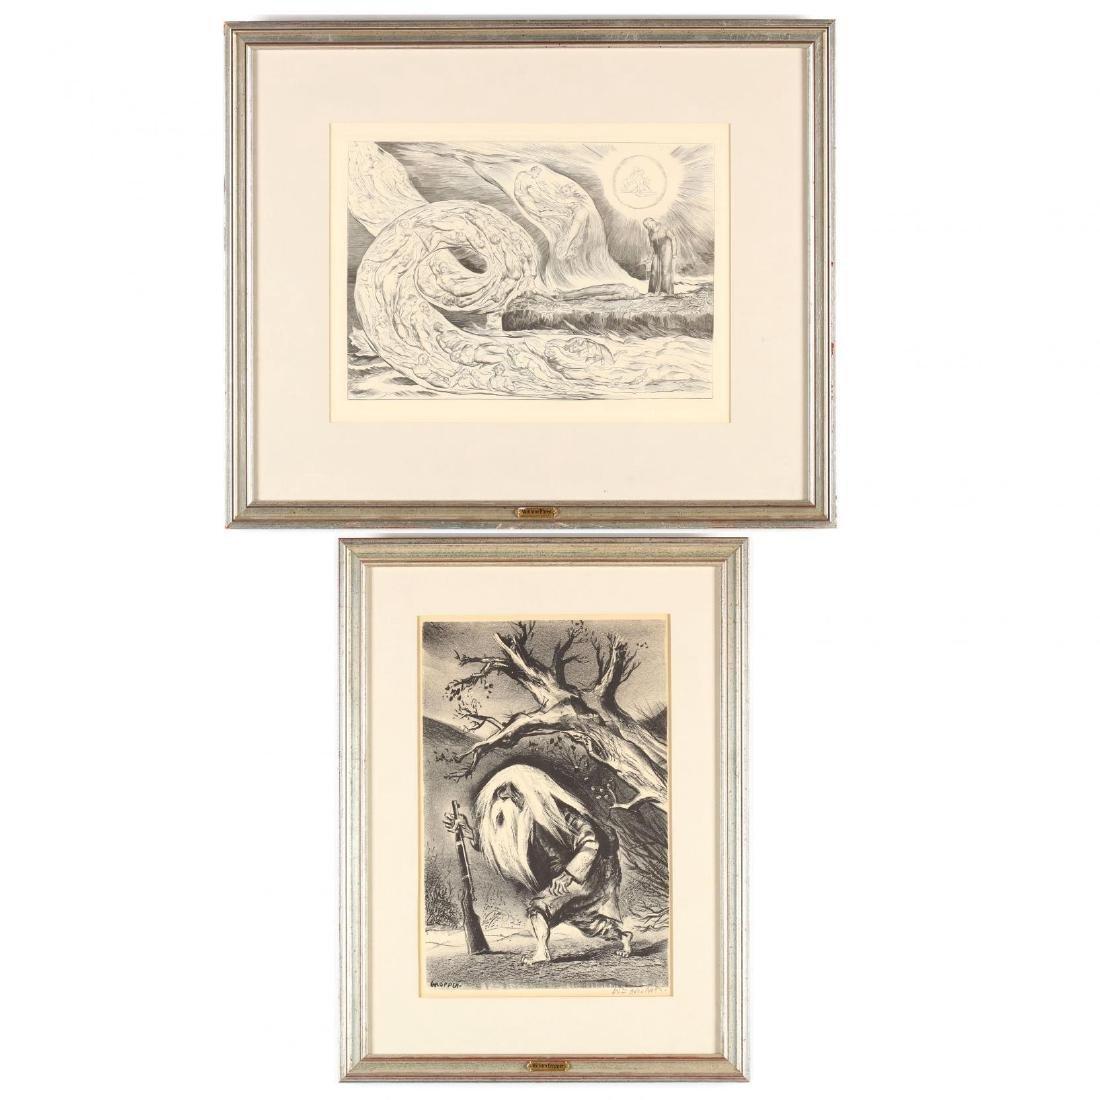 Two Framed Prints - Blake and Gropper